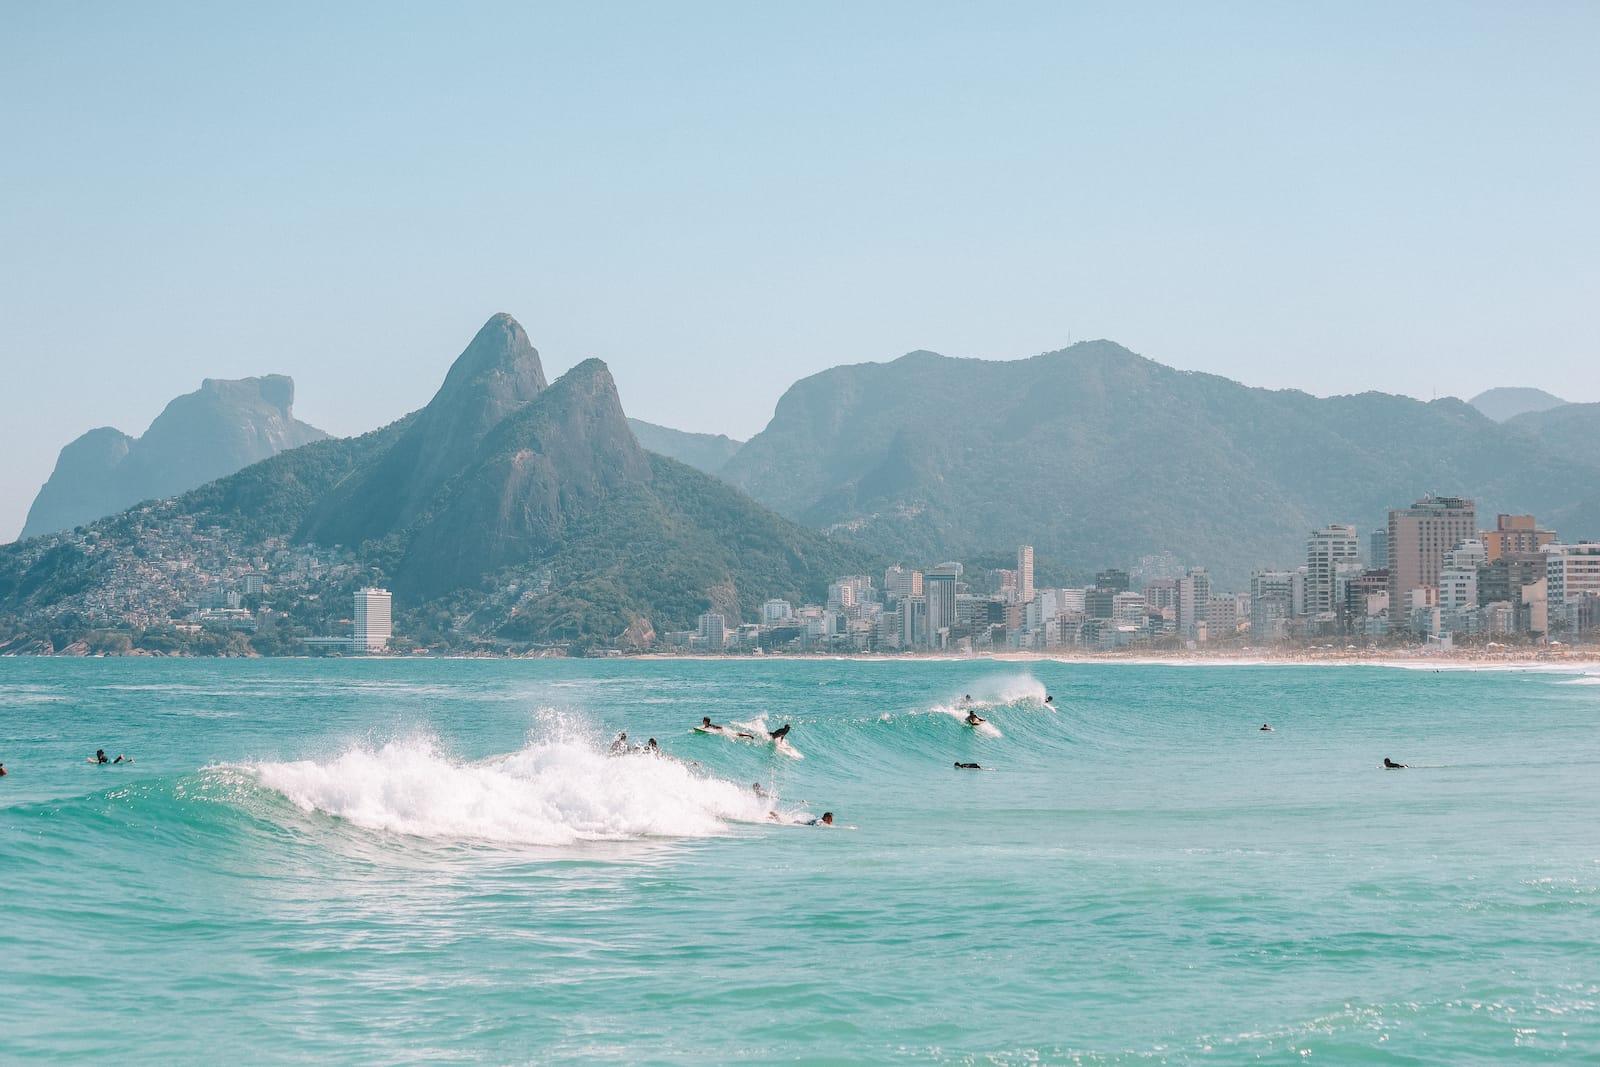 Photos And Postcards From Rio De Janeiro, Brazil (9)